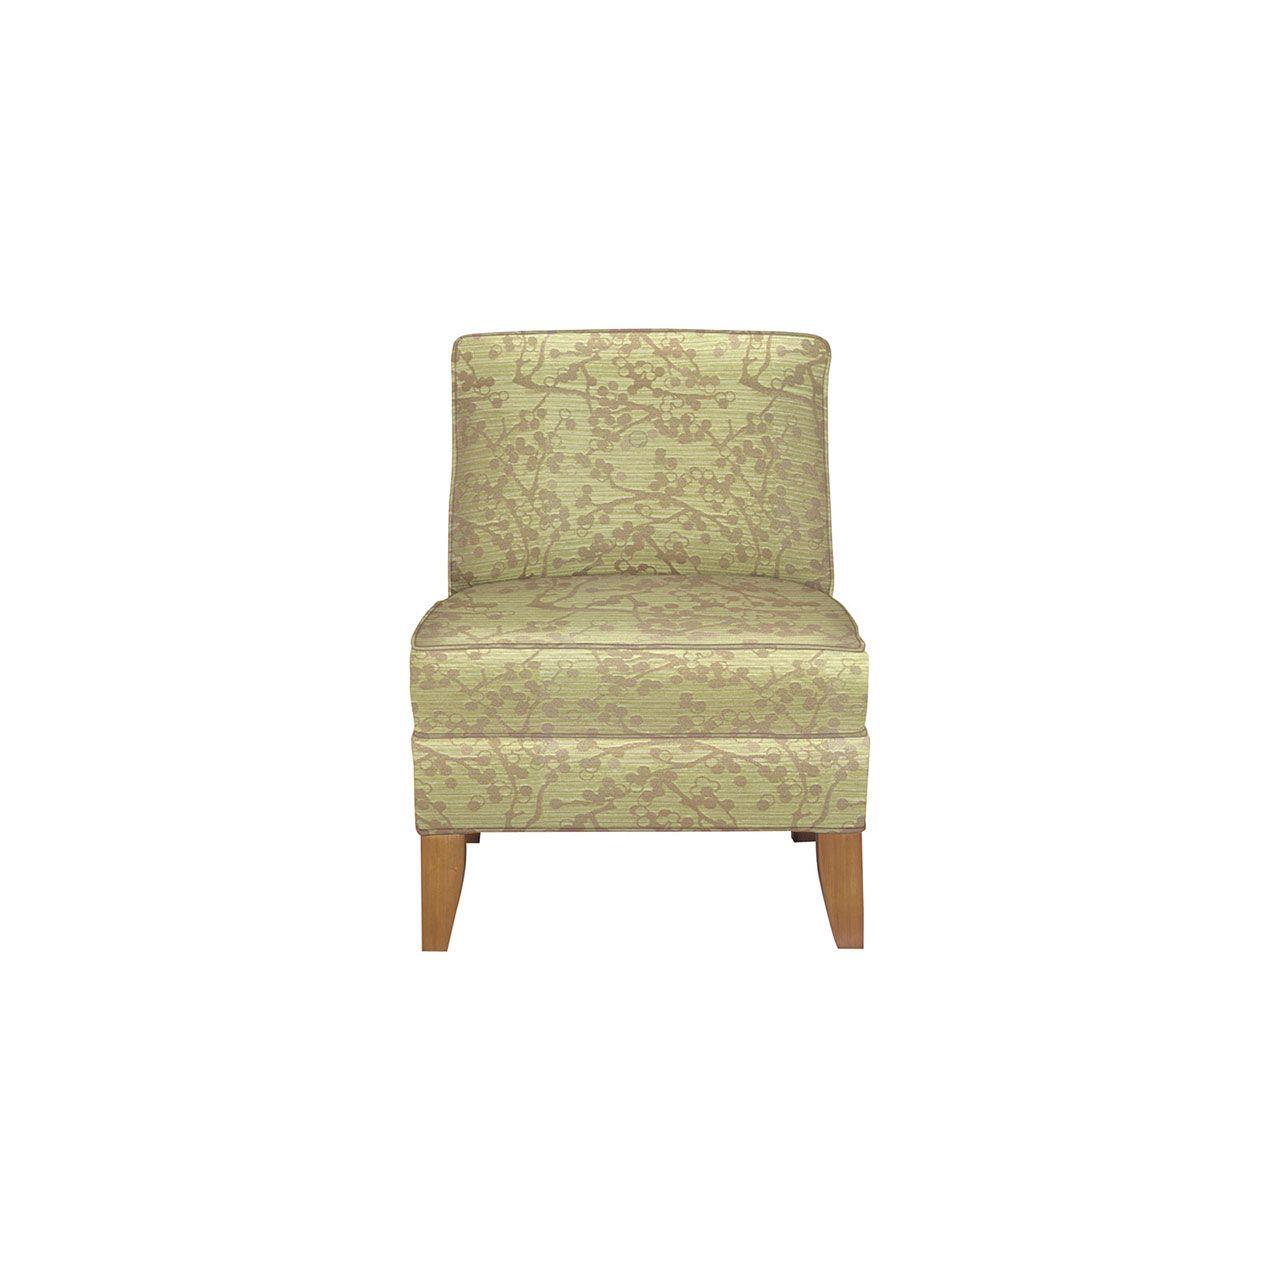 Find A Crypton Fabric Retailer Near You Shop Locally Or Online Crypton Chair Crypton Fabric Furniture